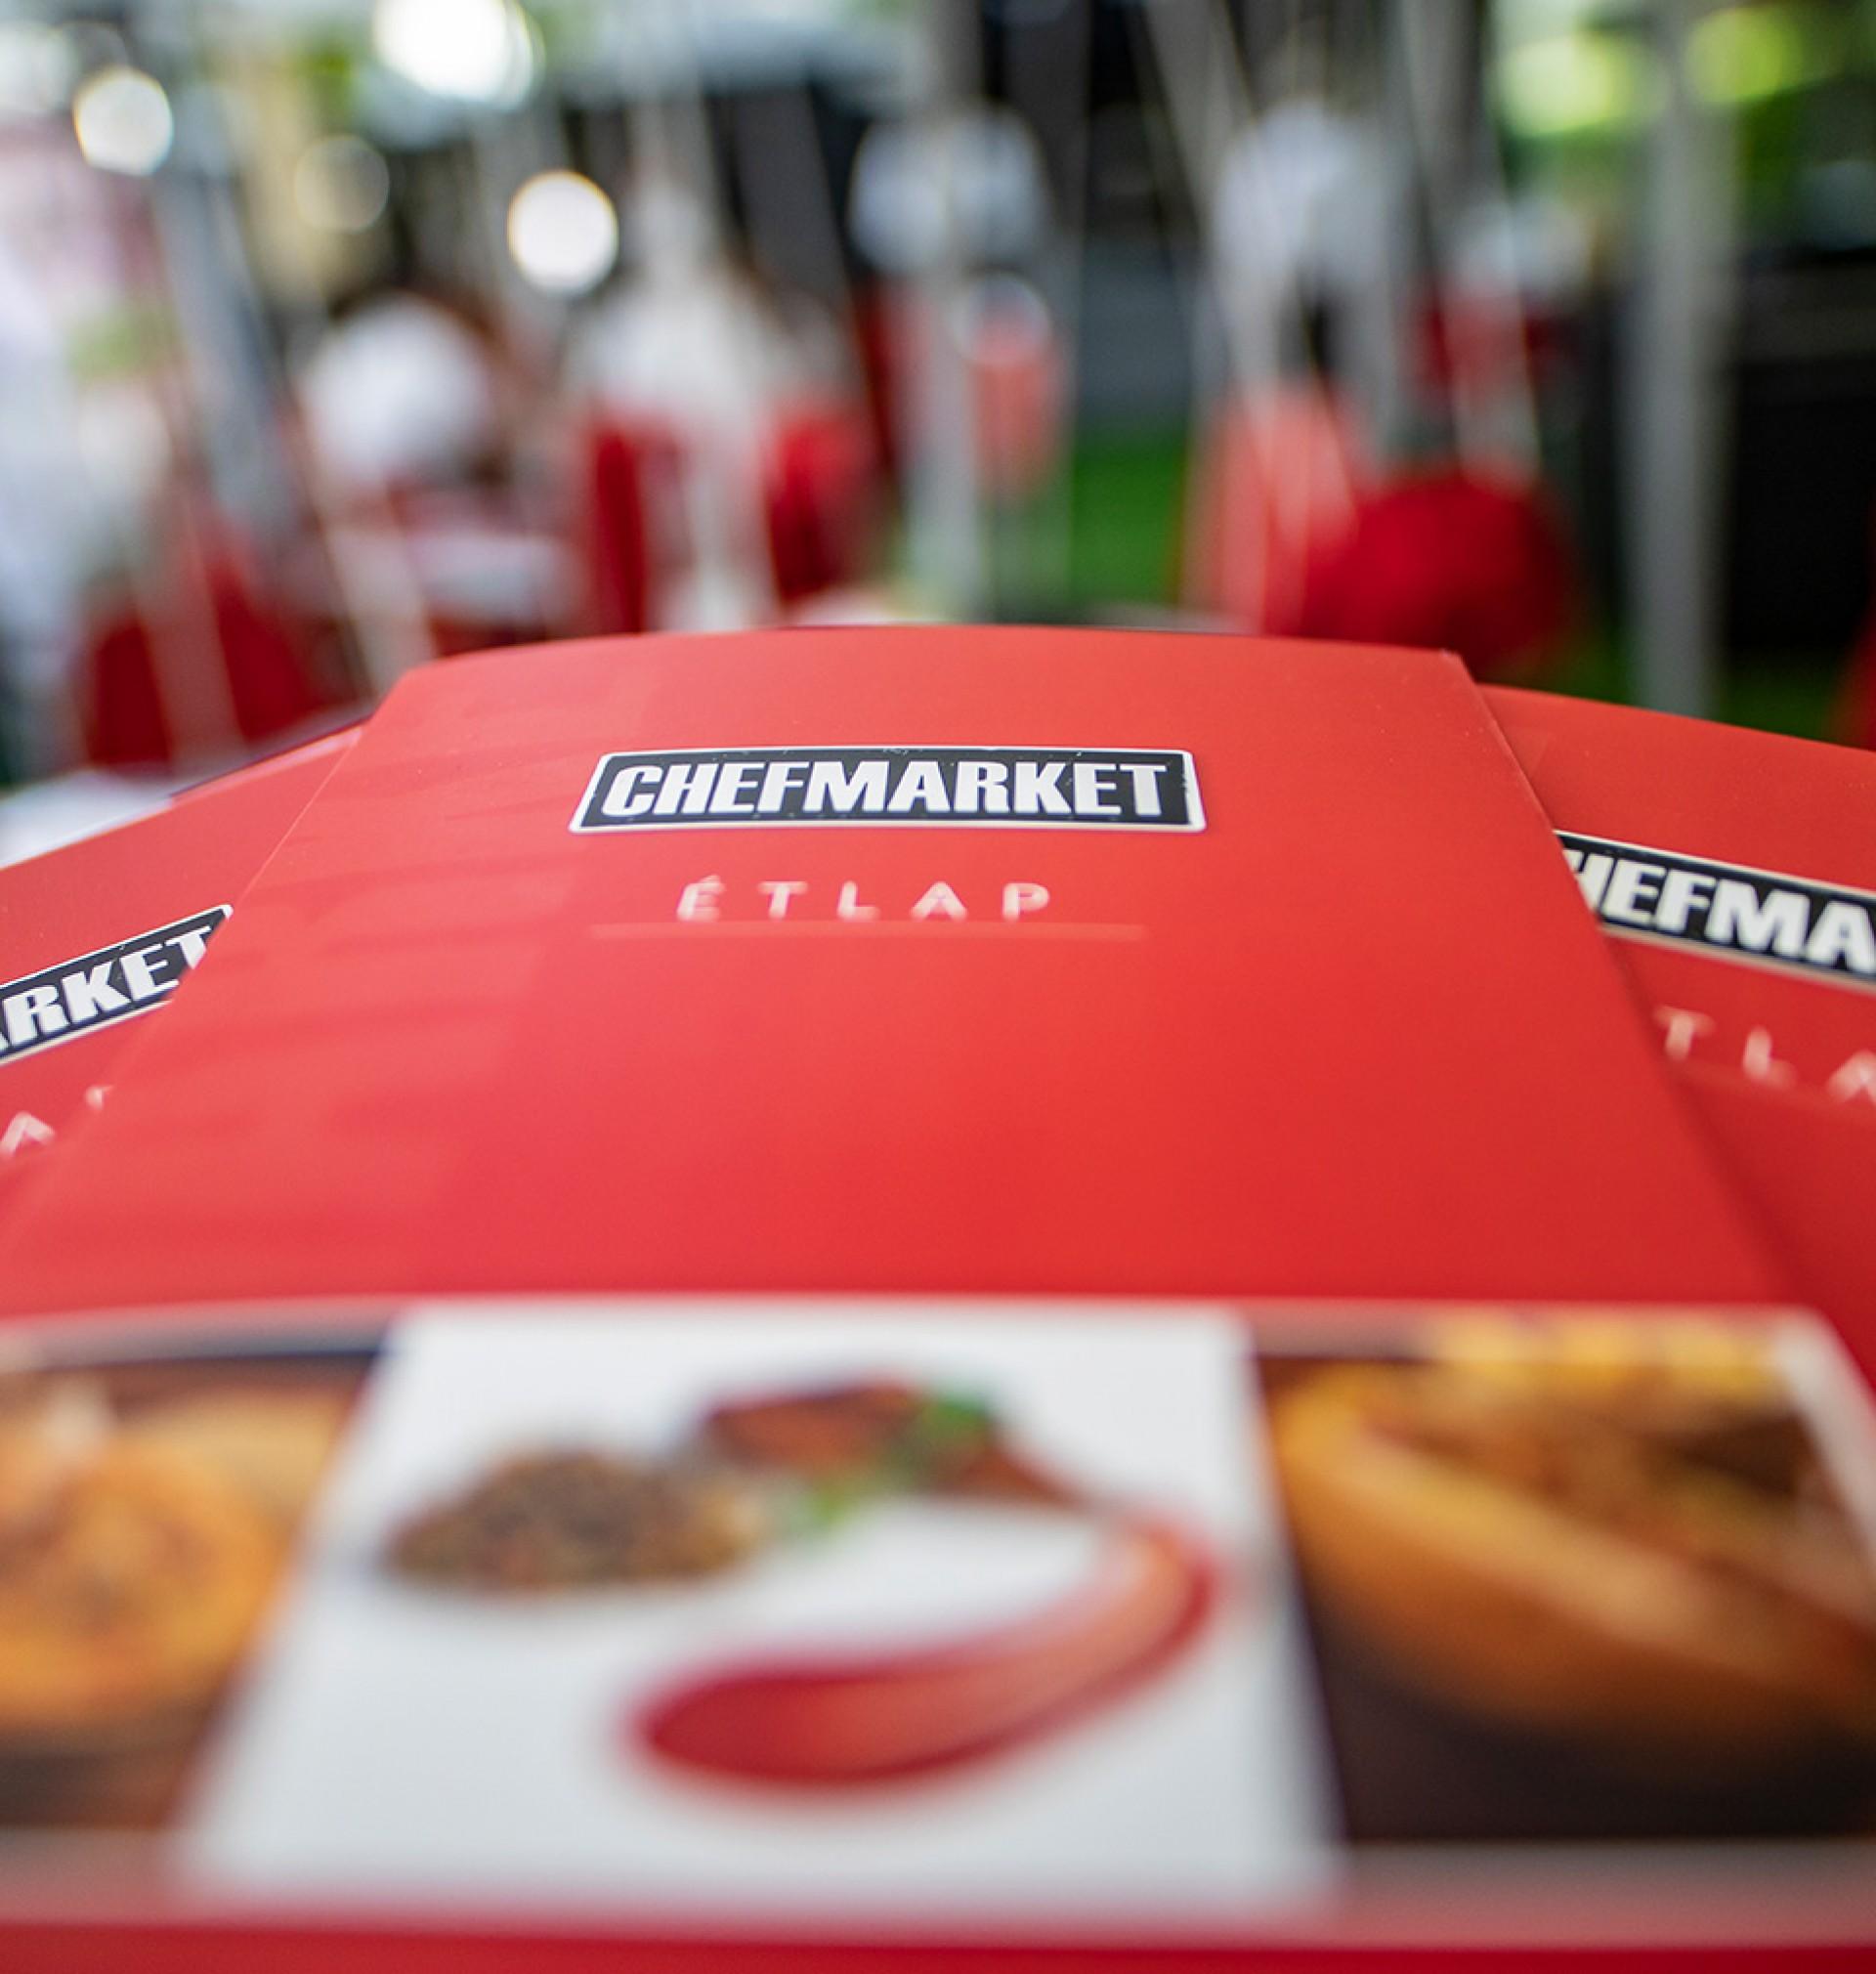 Chef Market Gourmet